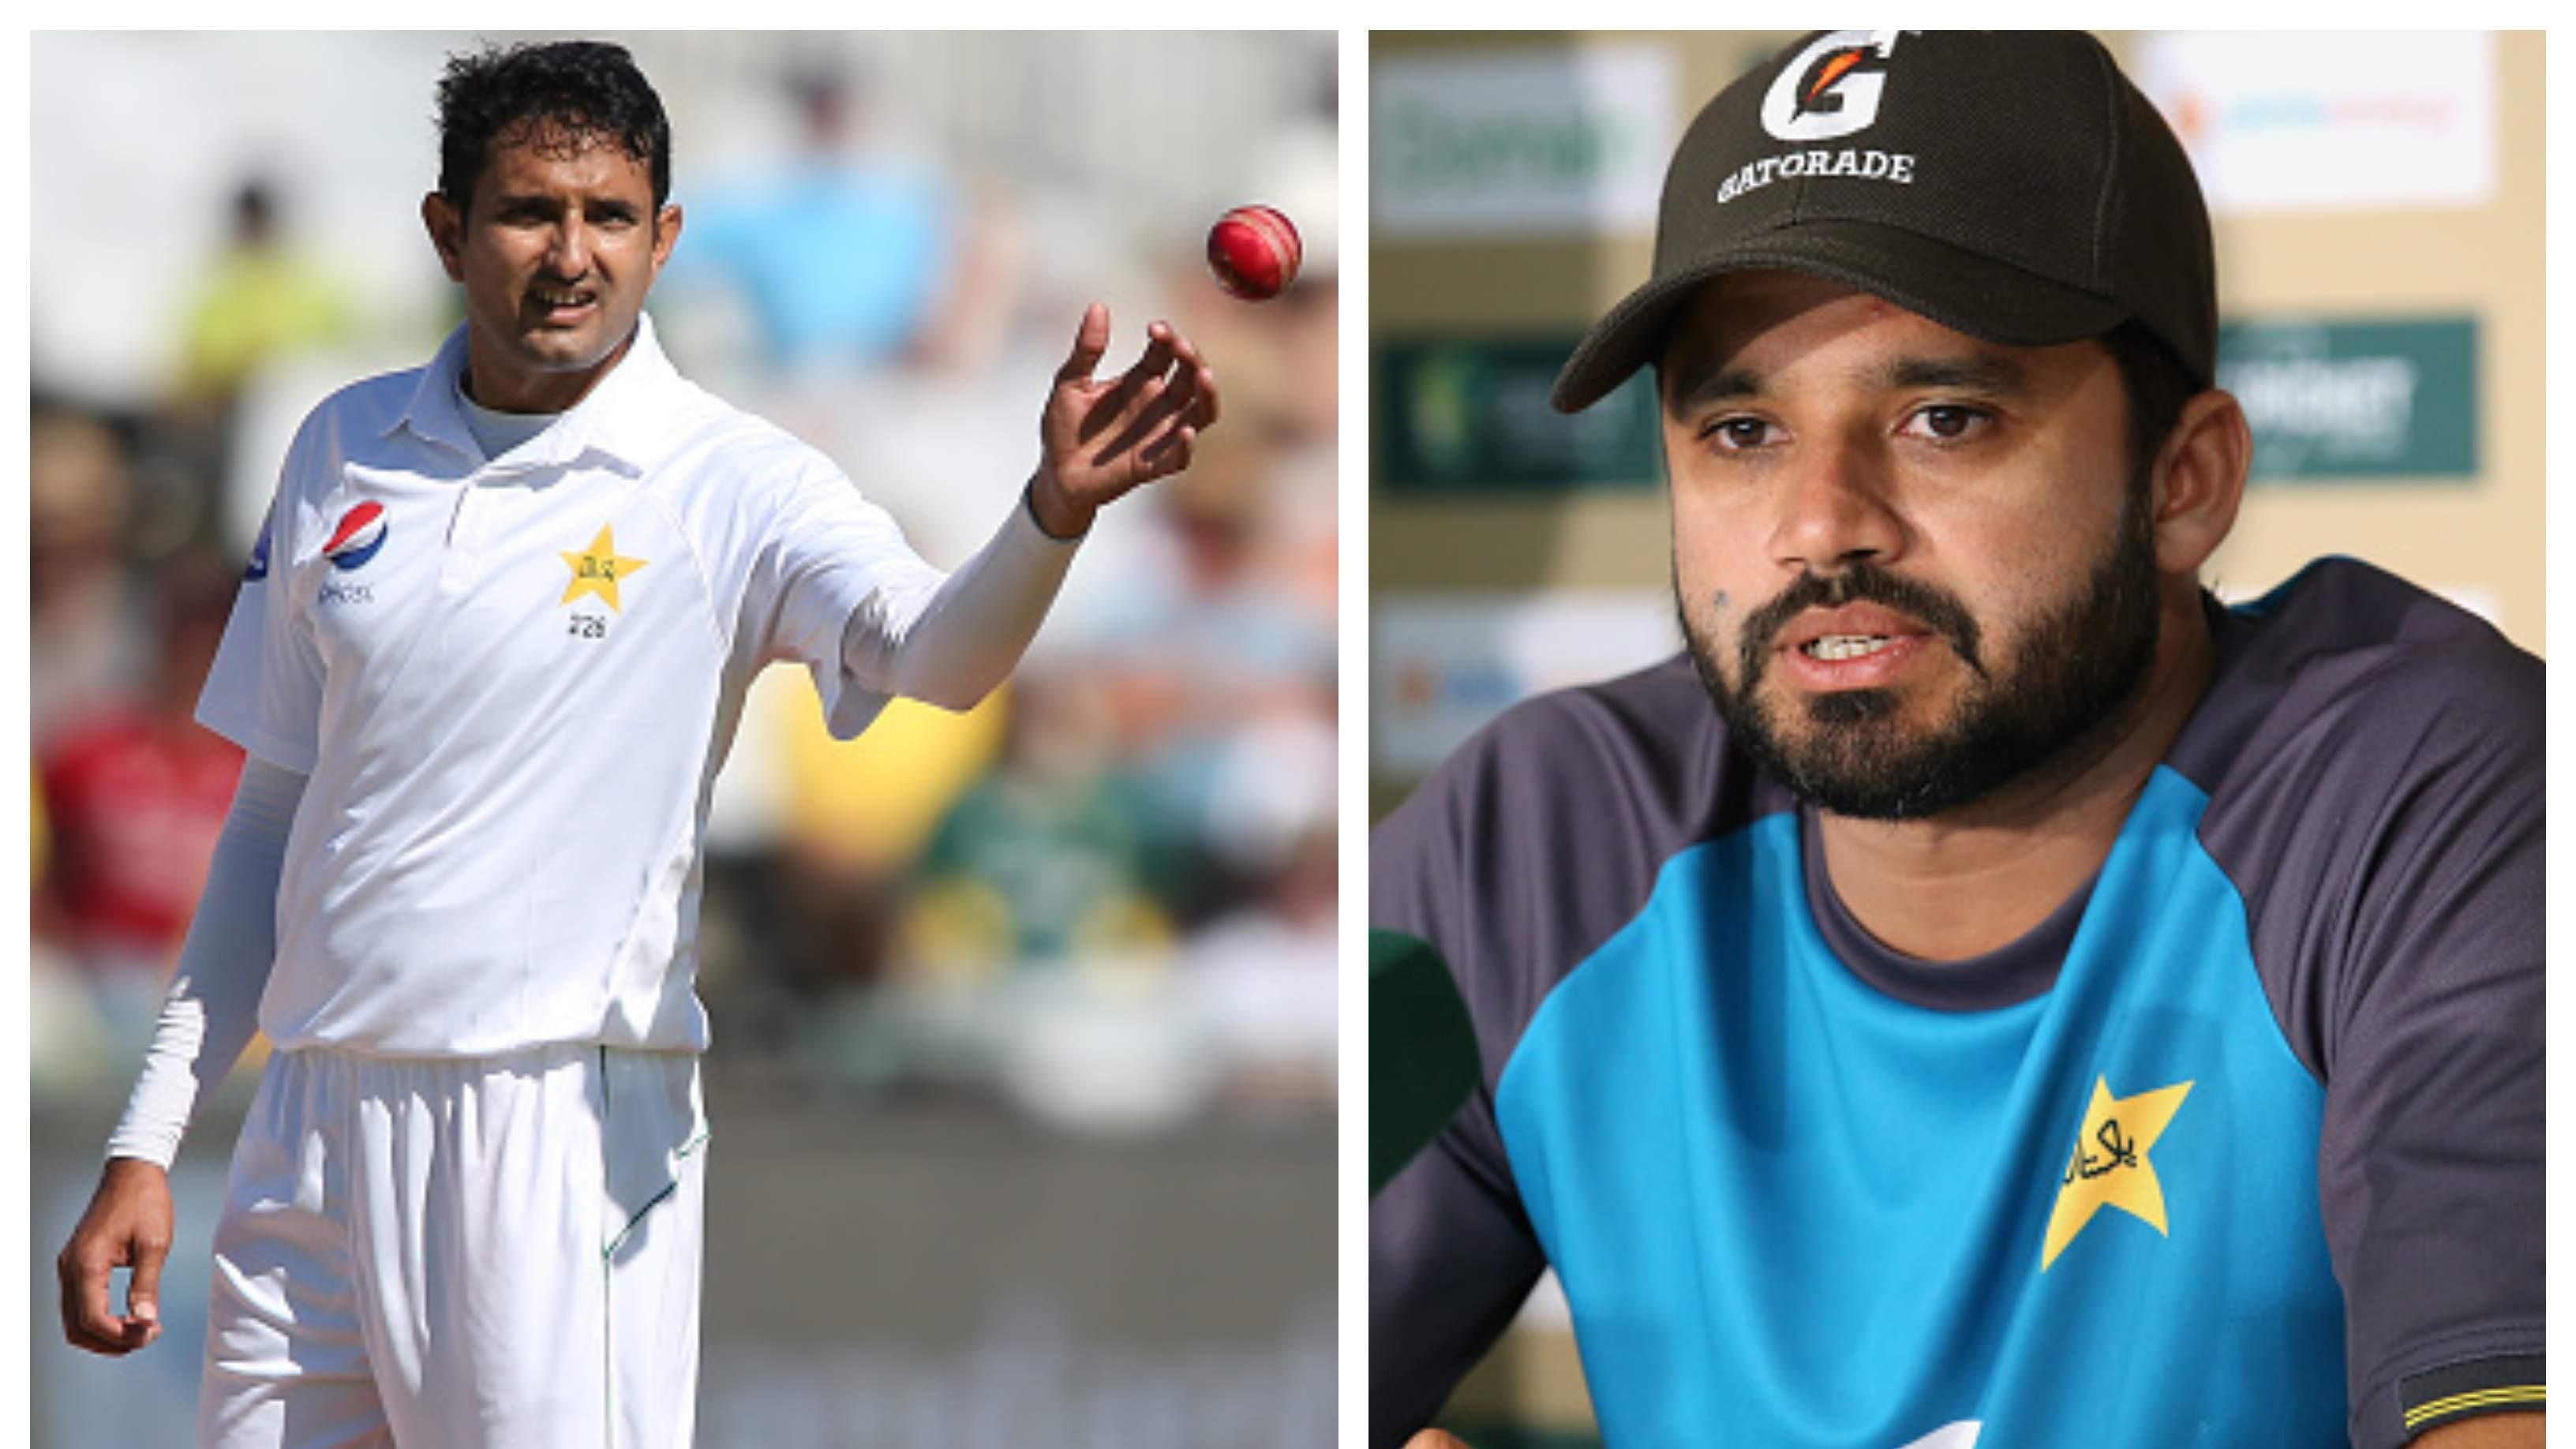 AUS v PAK 2019: Azhar Ali confirms Mohammad Abbas' inclusion for Adelaide Test